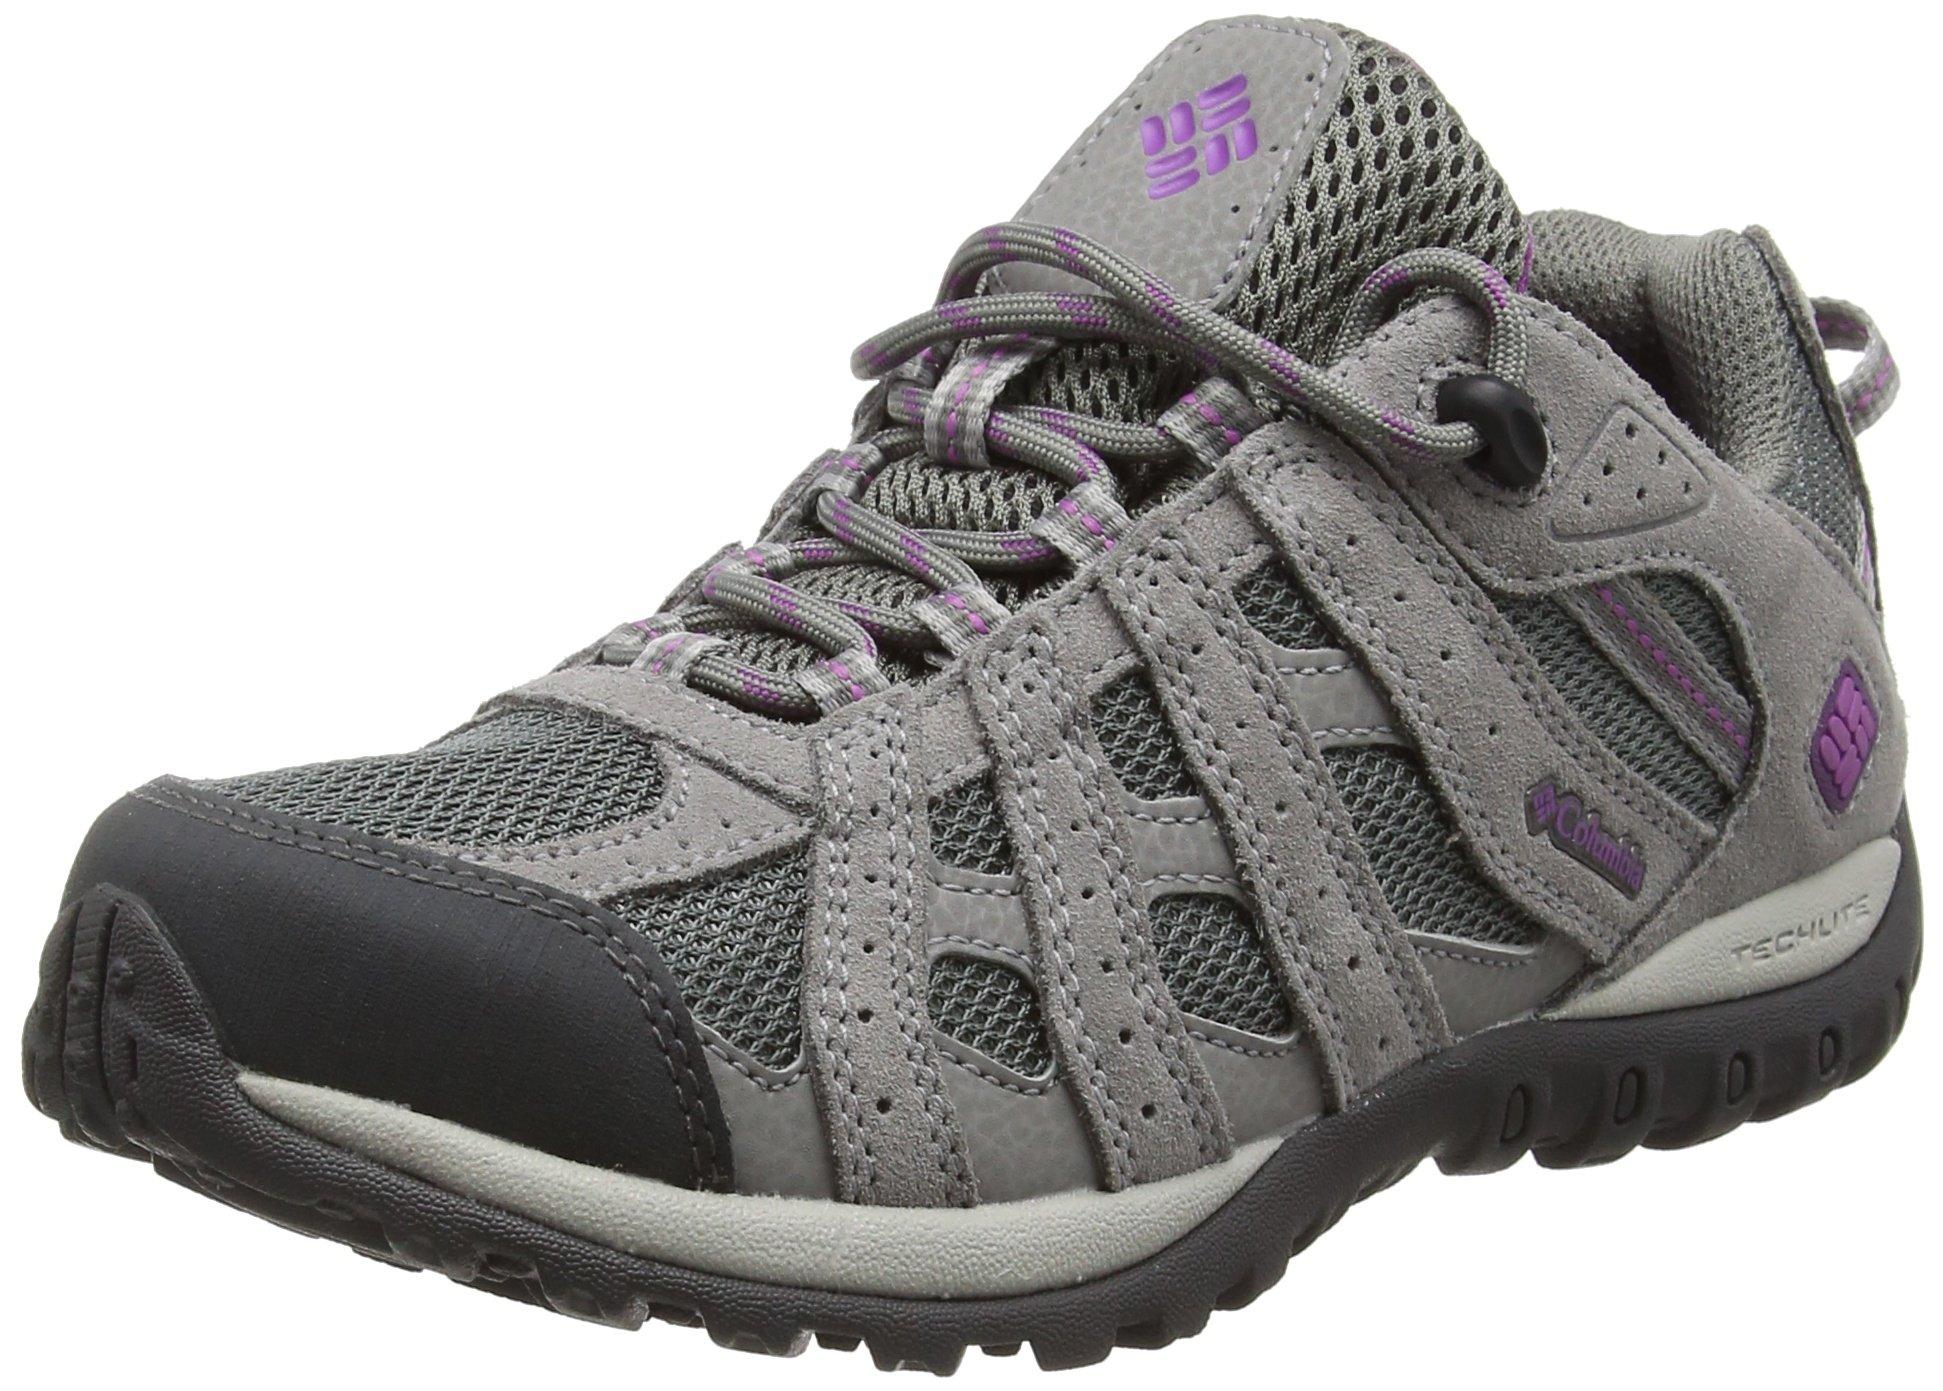 Columbia Women's Redmond Waterproof Hiking Shoe Charcoal, Razzle 5.5 B US